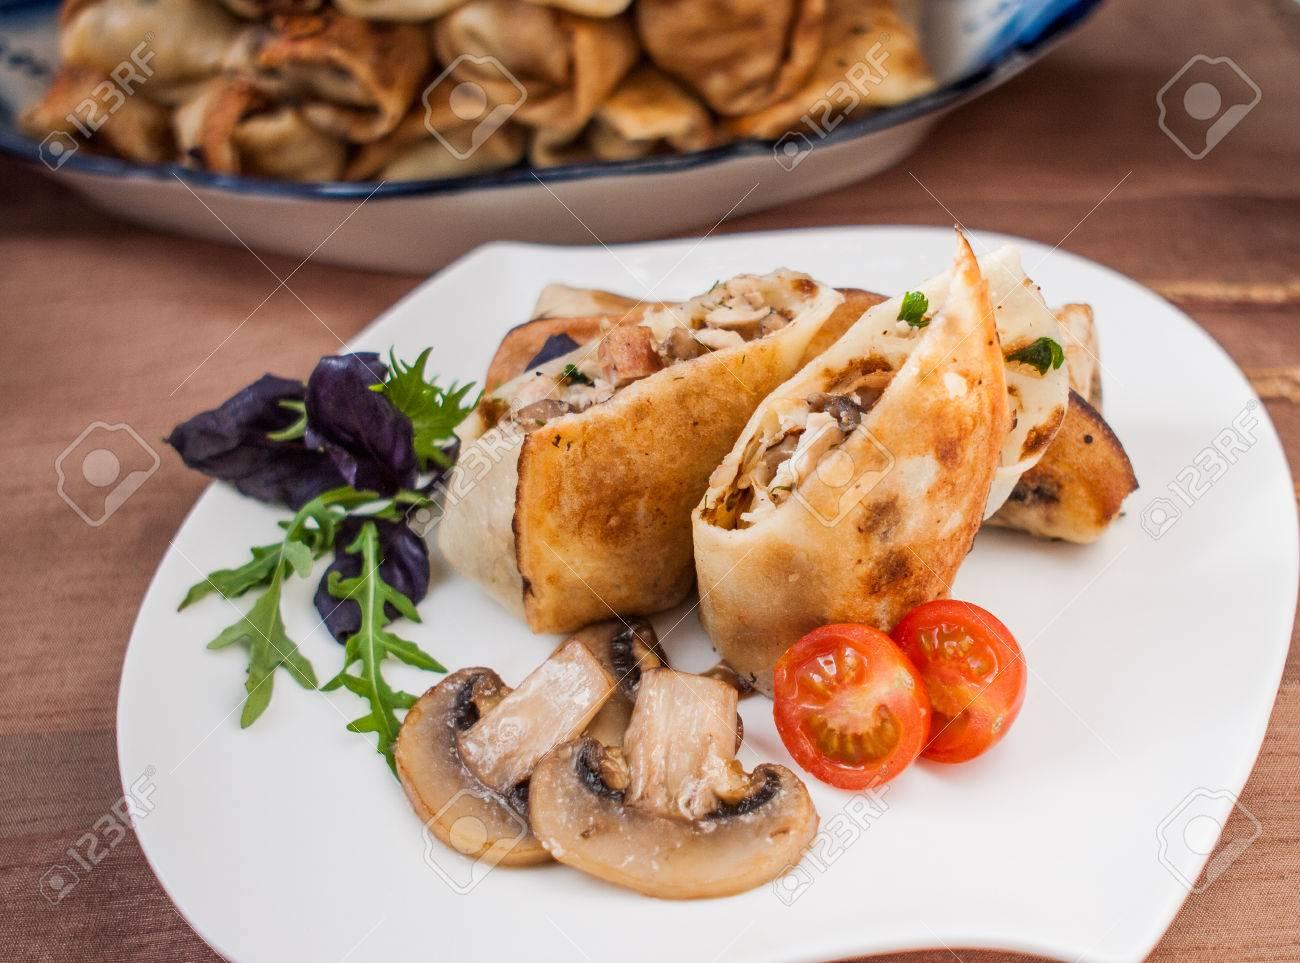 Stuffed pancakes recipe chicken